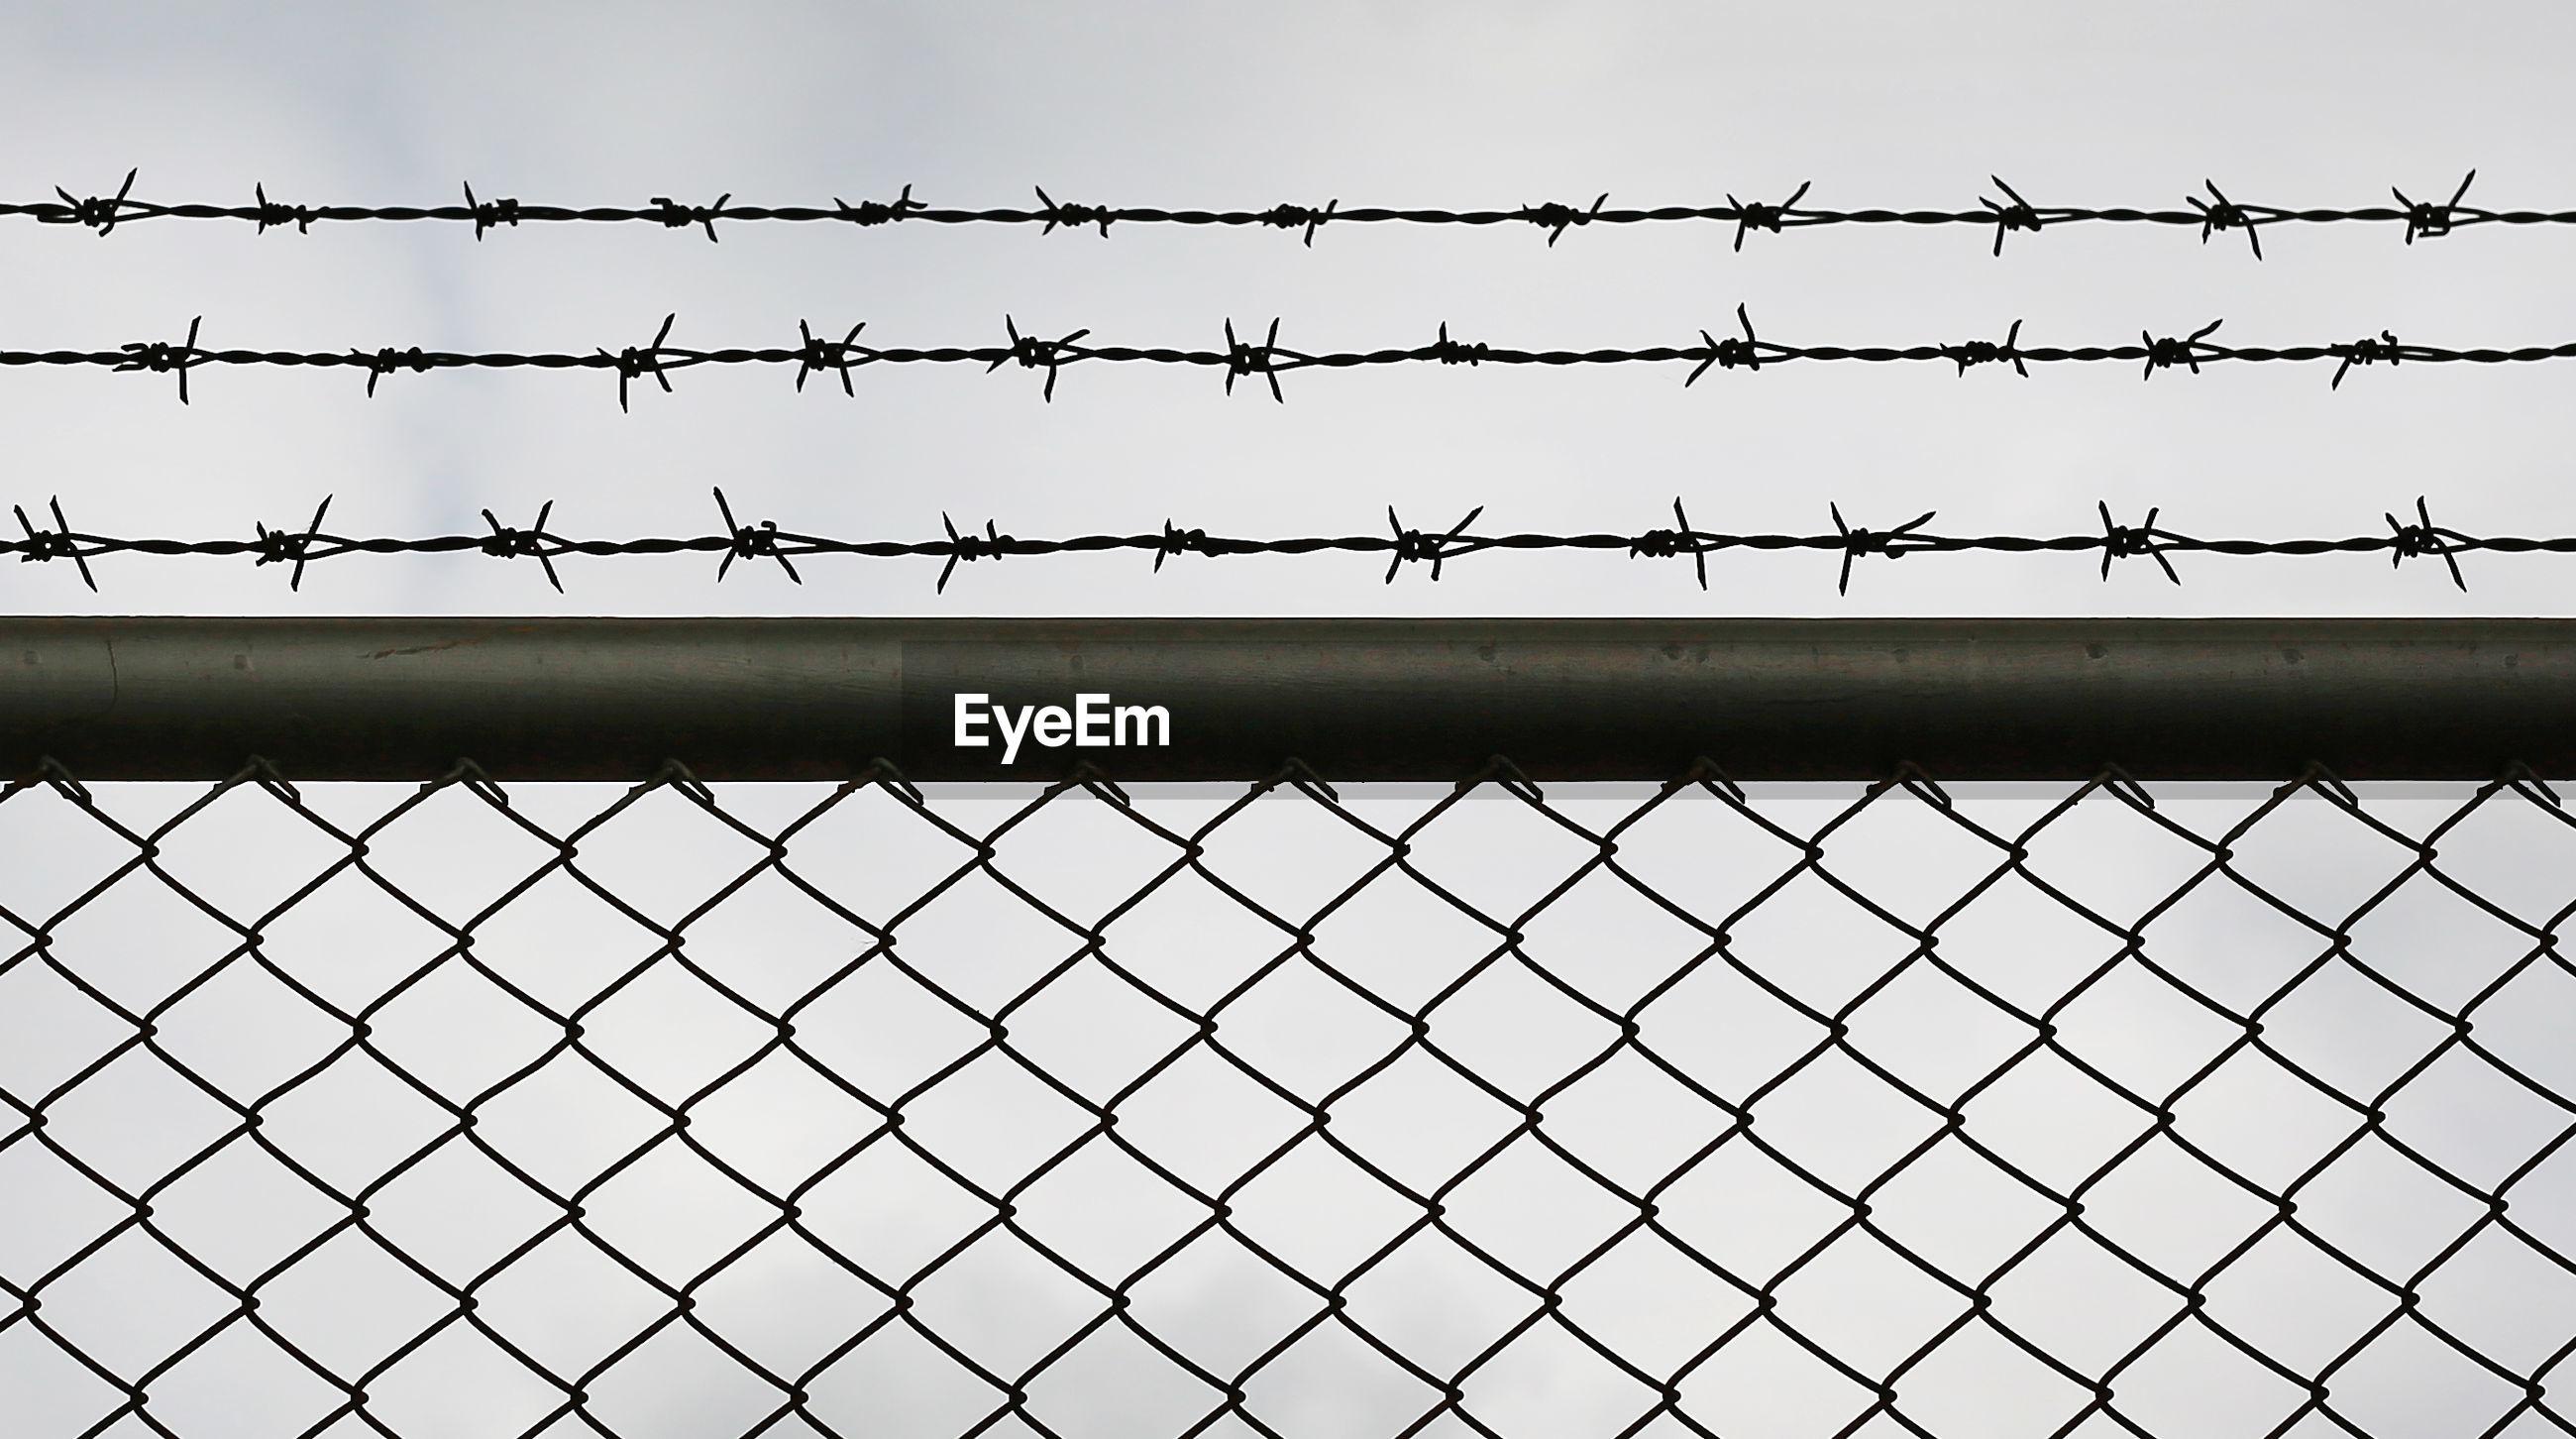 Fence against clear sky